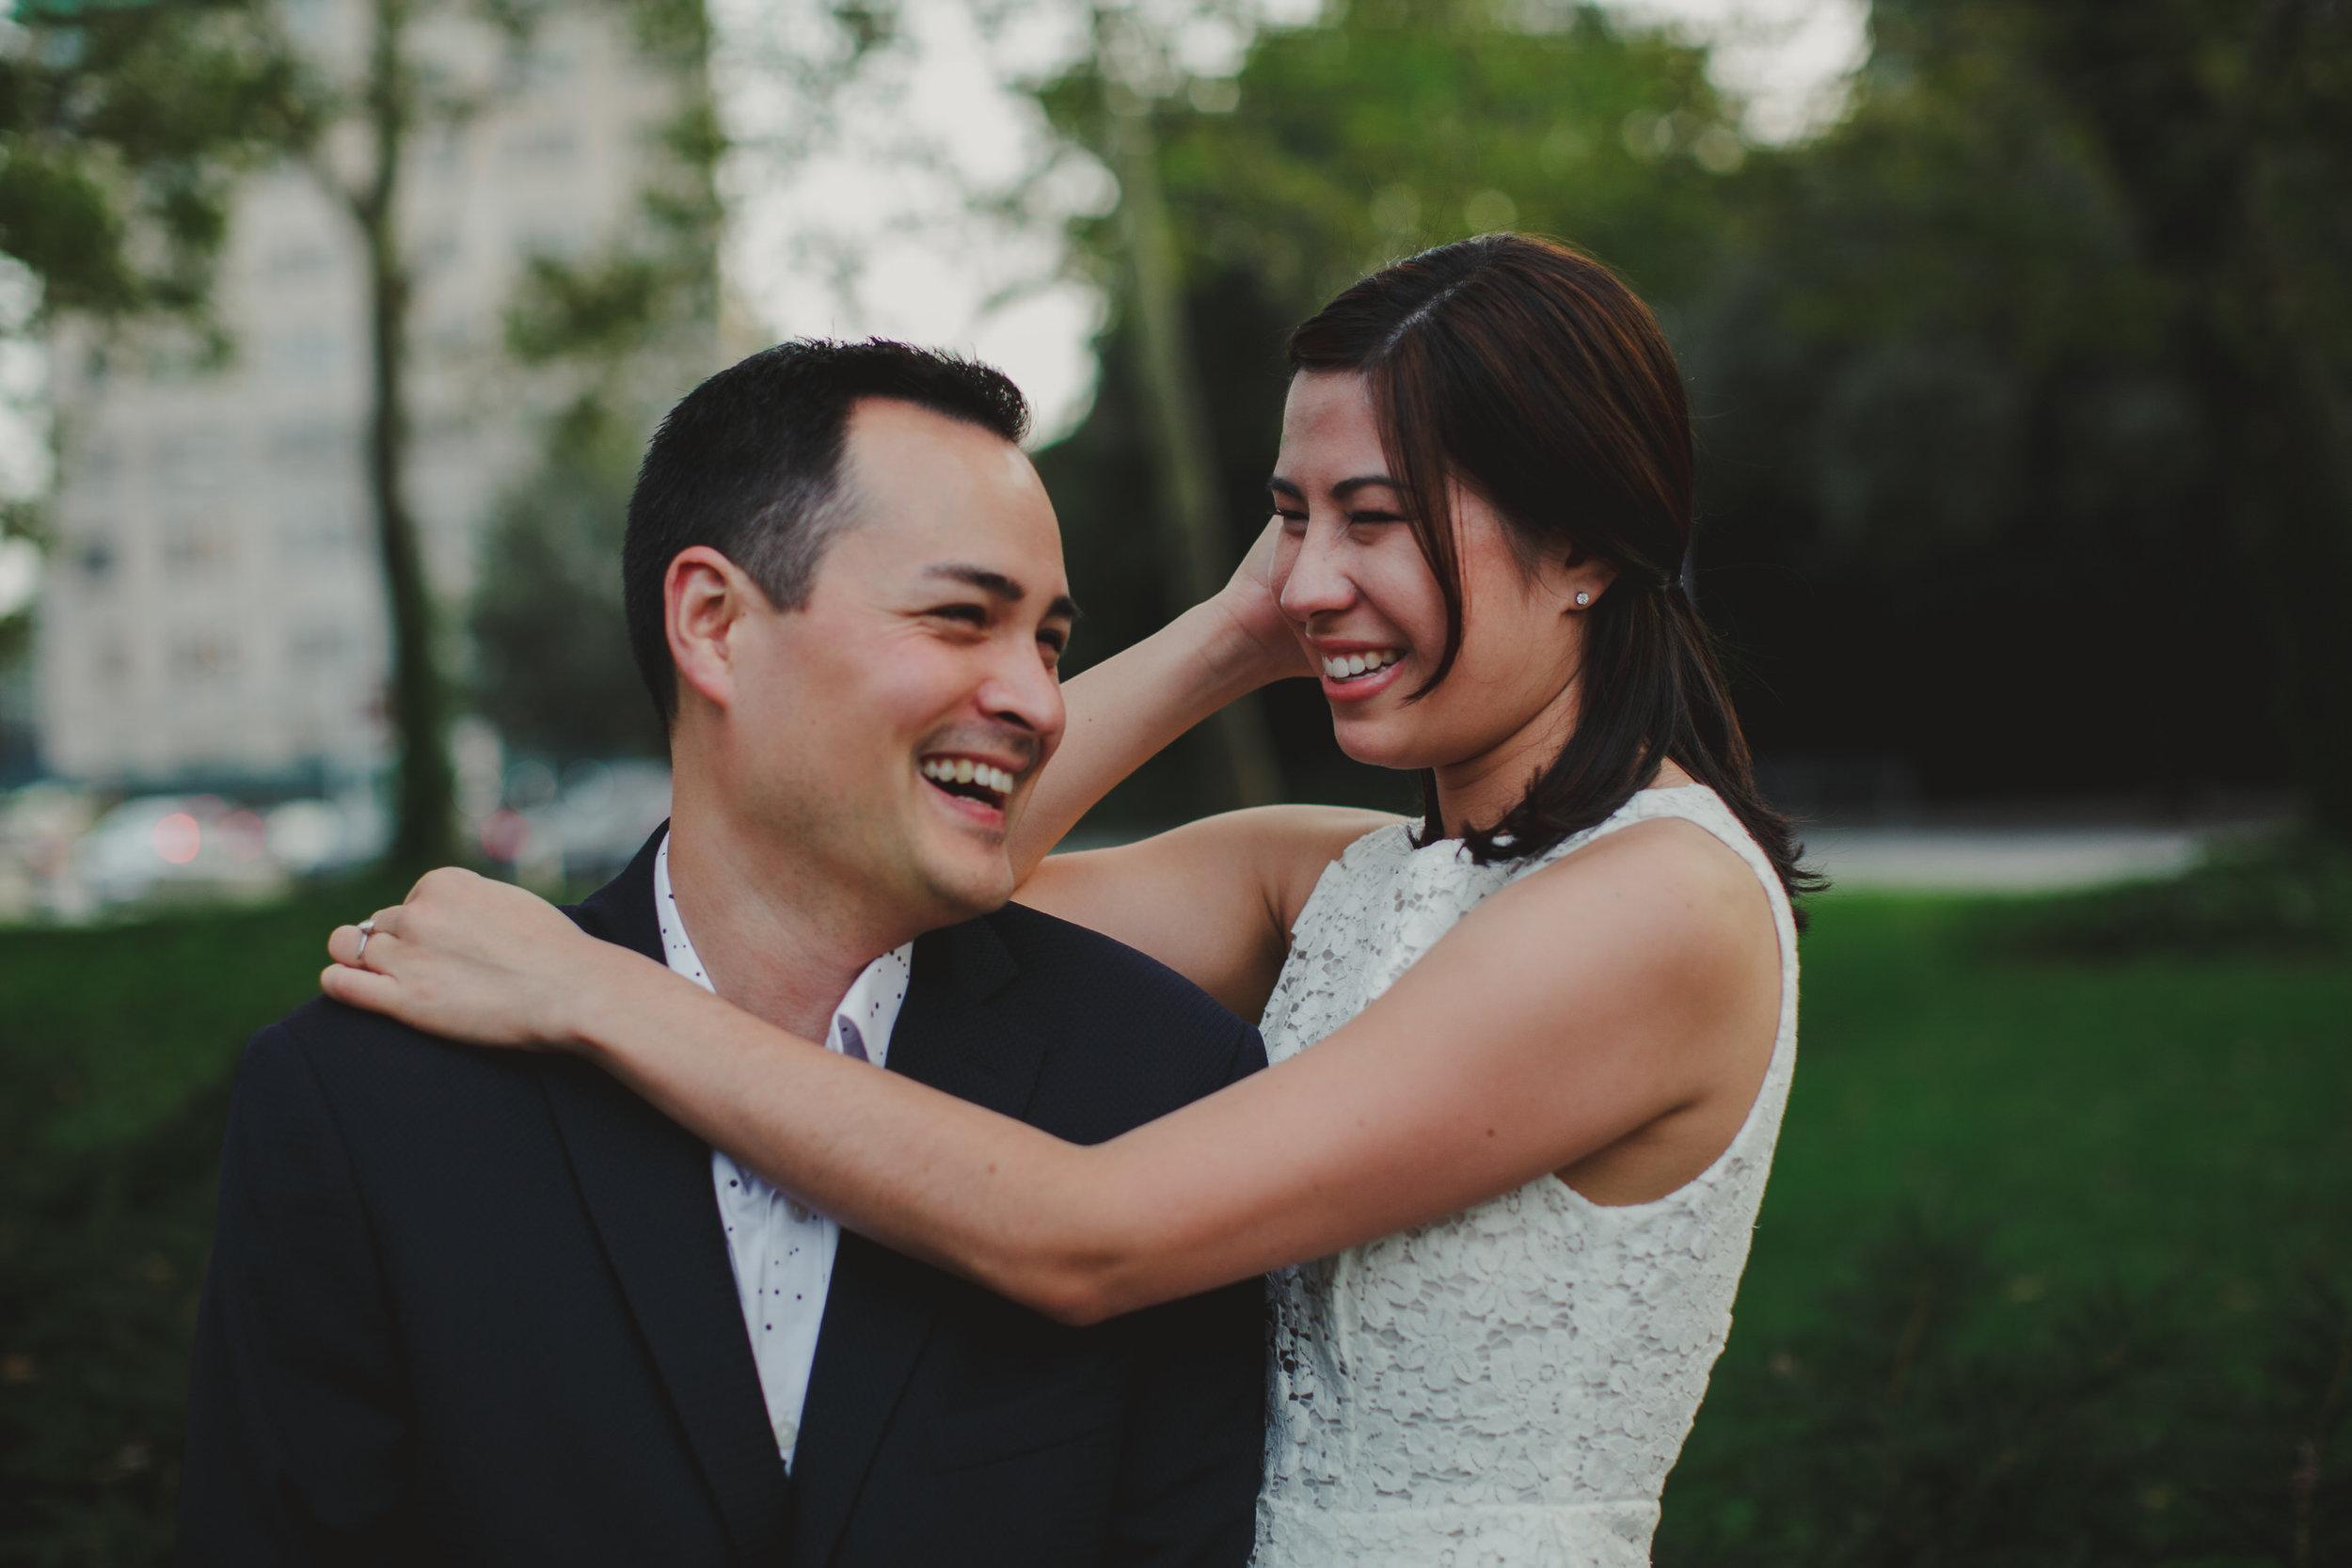 couple_laughing_moments_tiny_house_photo_documentary_engagement_photography.jpg